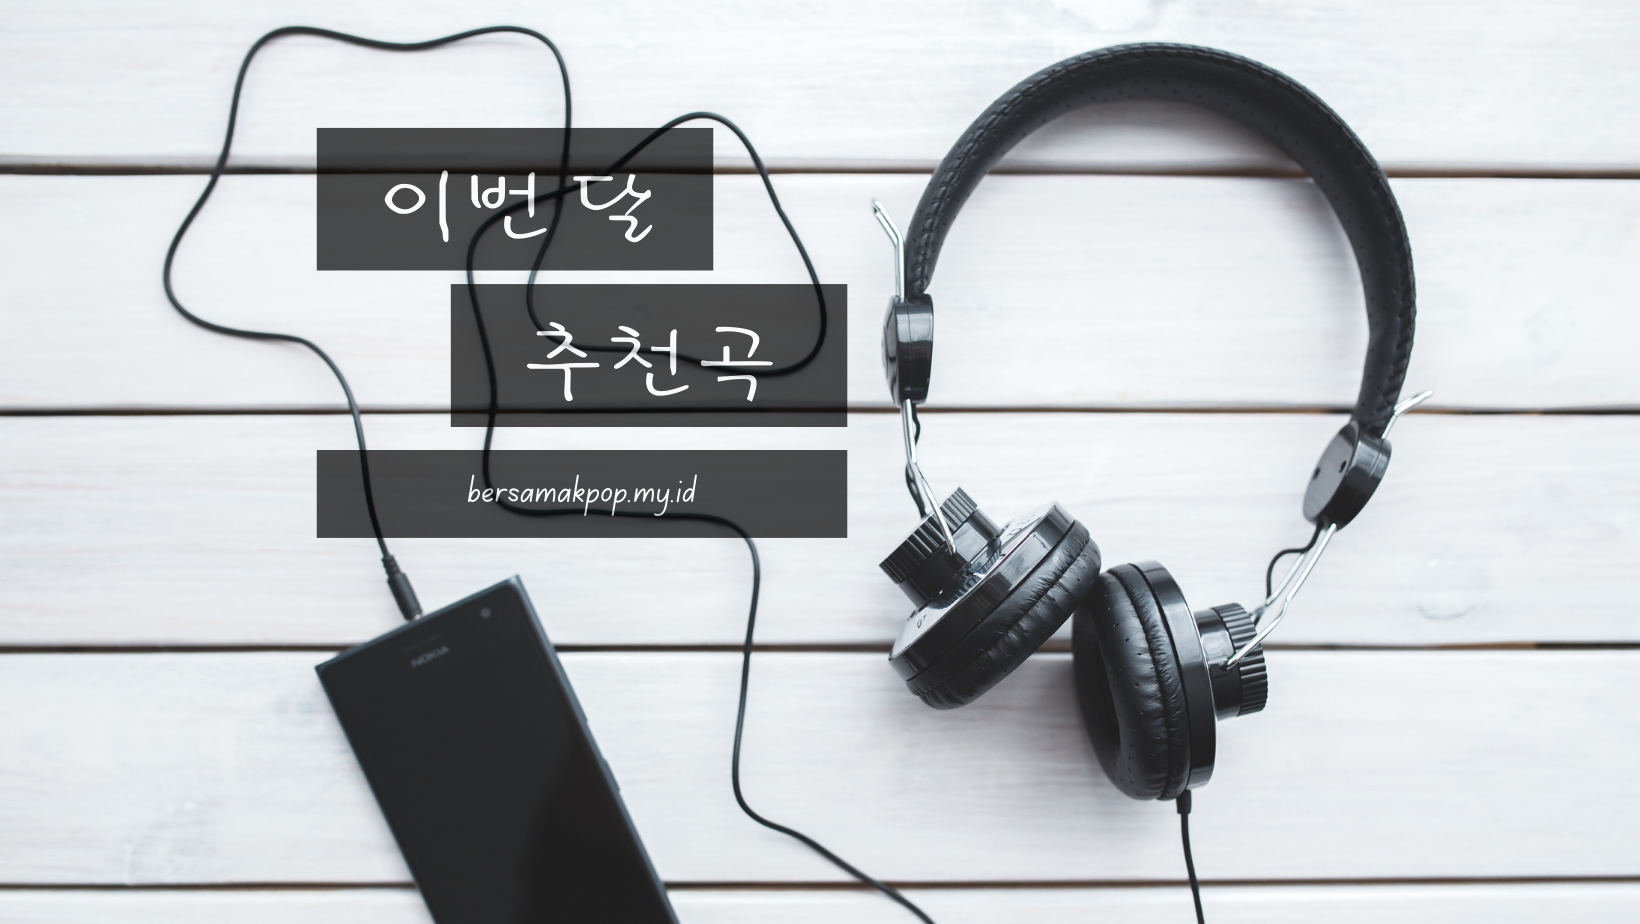 bersamakpop.my.id